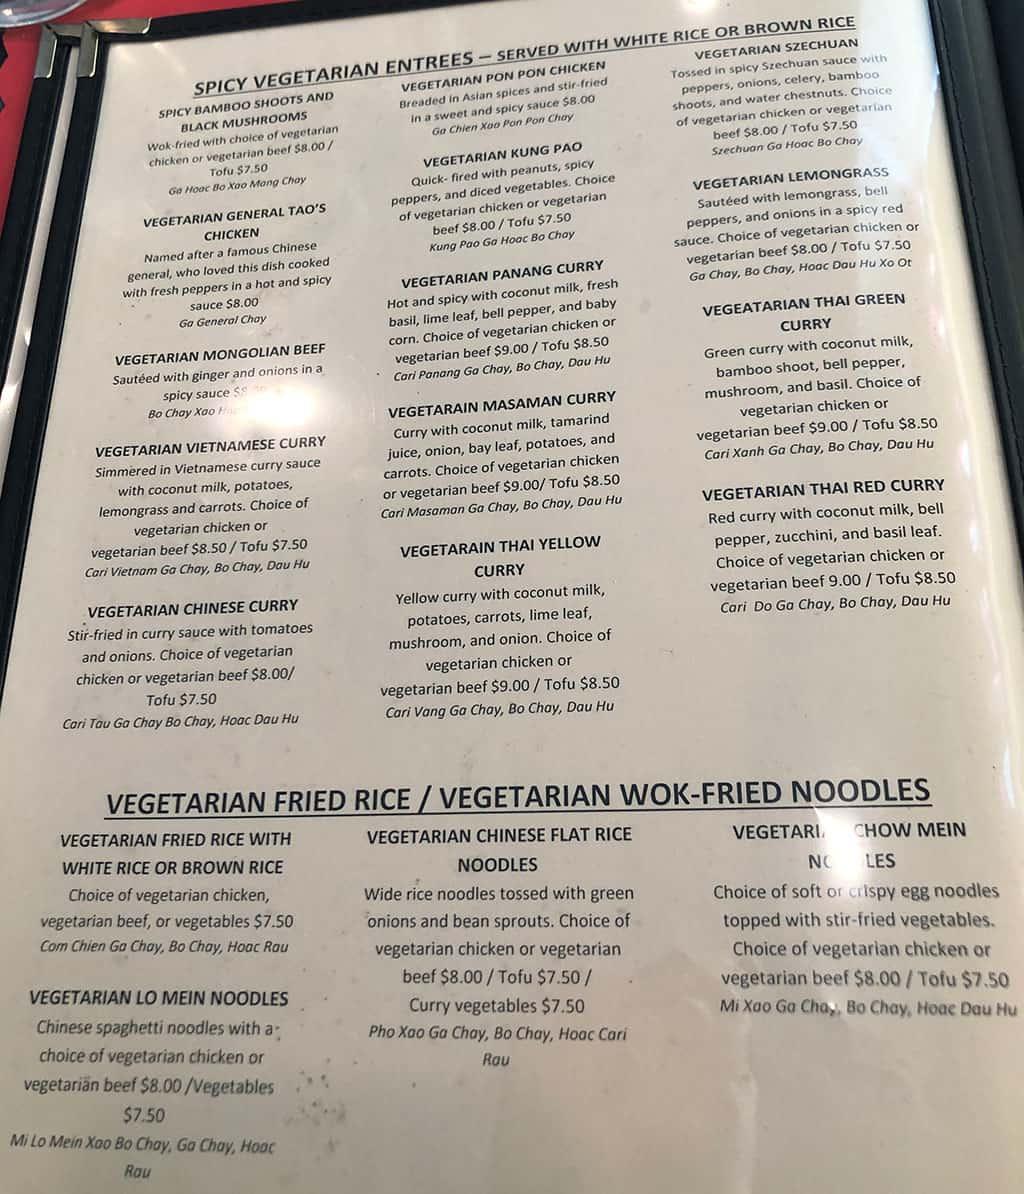 Shanghai Cafe menu - spicy vegetarian entrees, fried rice, fried noodles